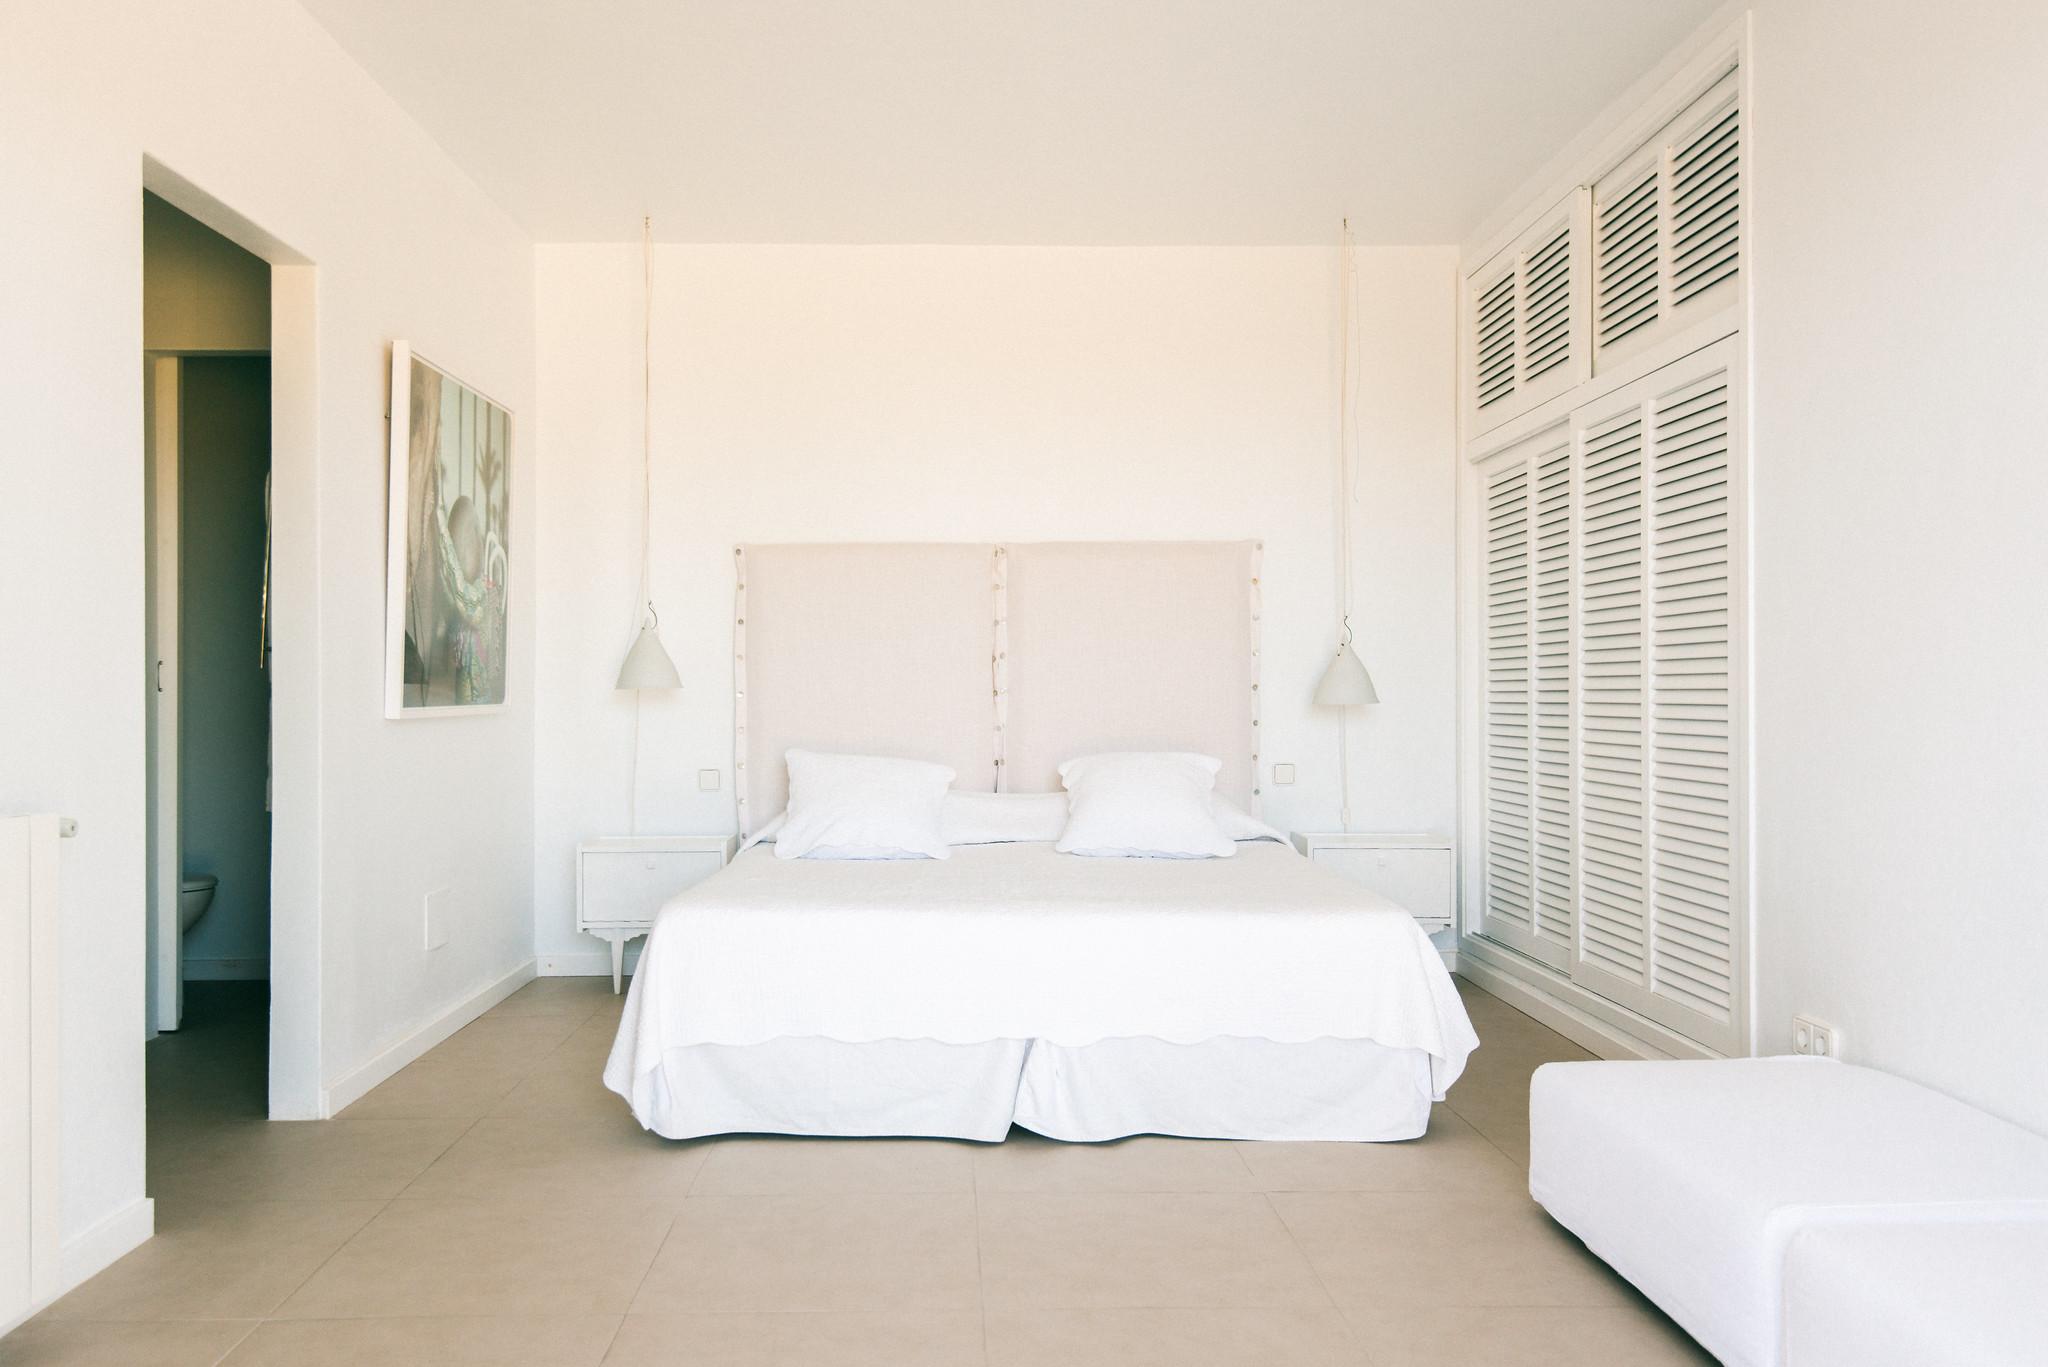 https://www.white-ibiza.com/wp-content/uploads/2020/06/white-ibiza-villas-casa-odette-interior-bedroom7.jpg